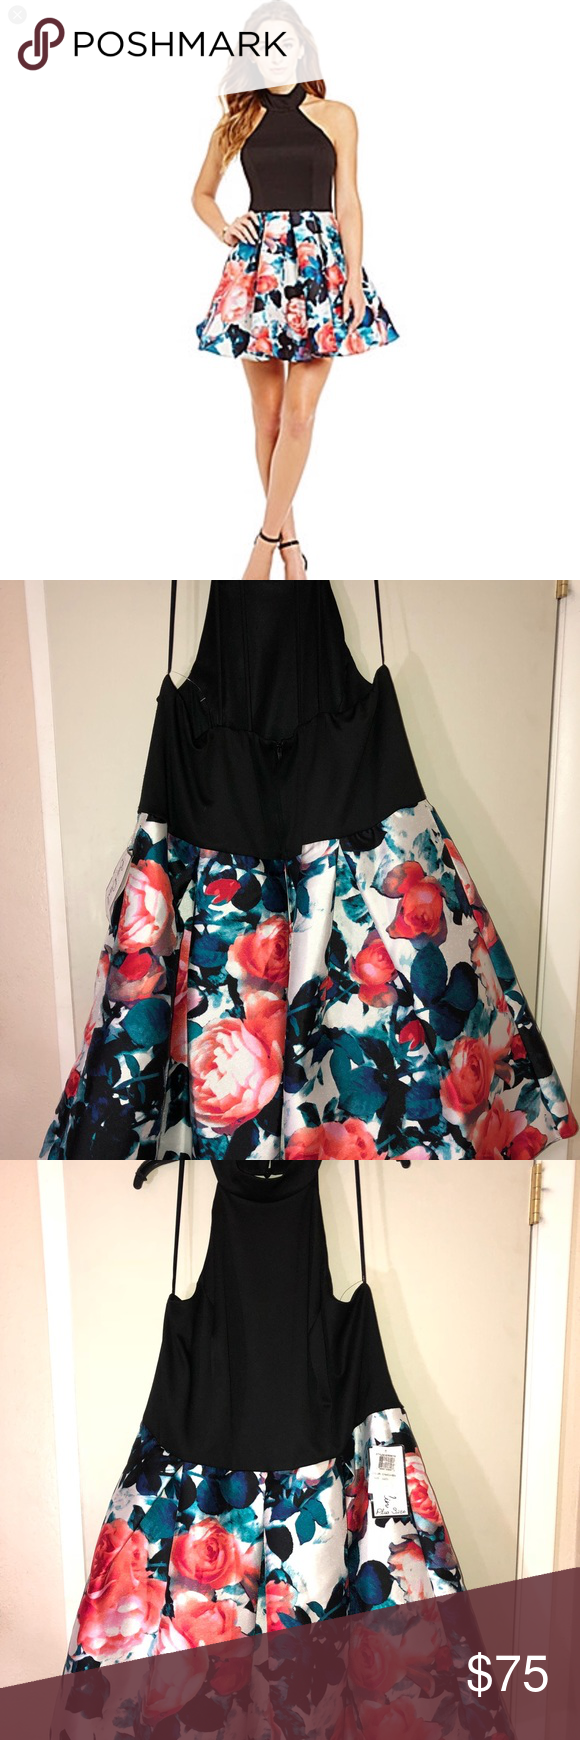 Nwt b darlin black halter floral prom dress nwt floral prom